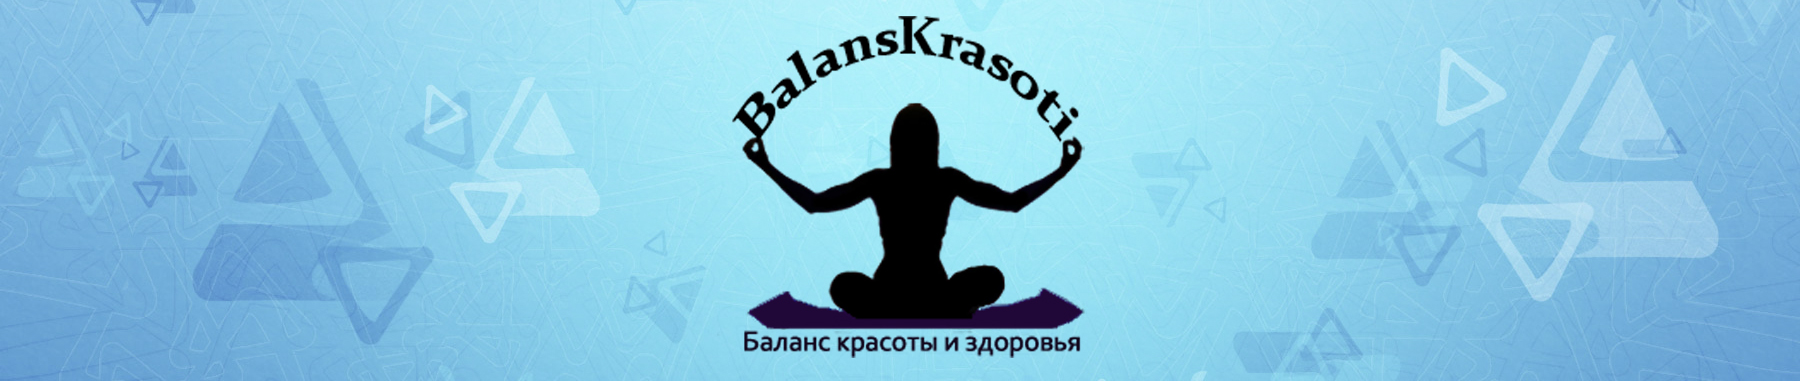 BalansKrasoti.ru